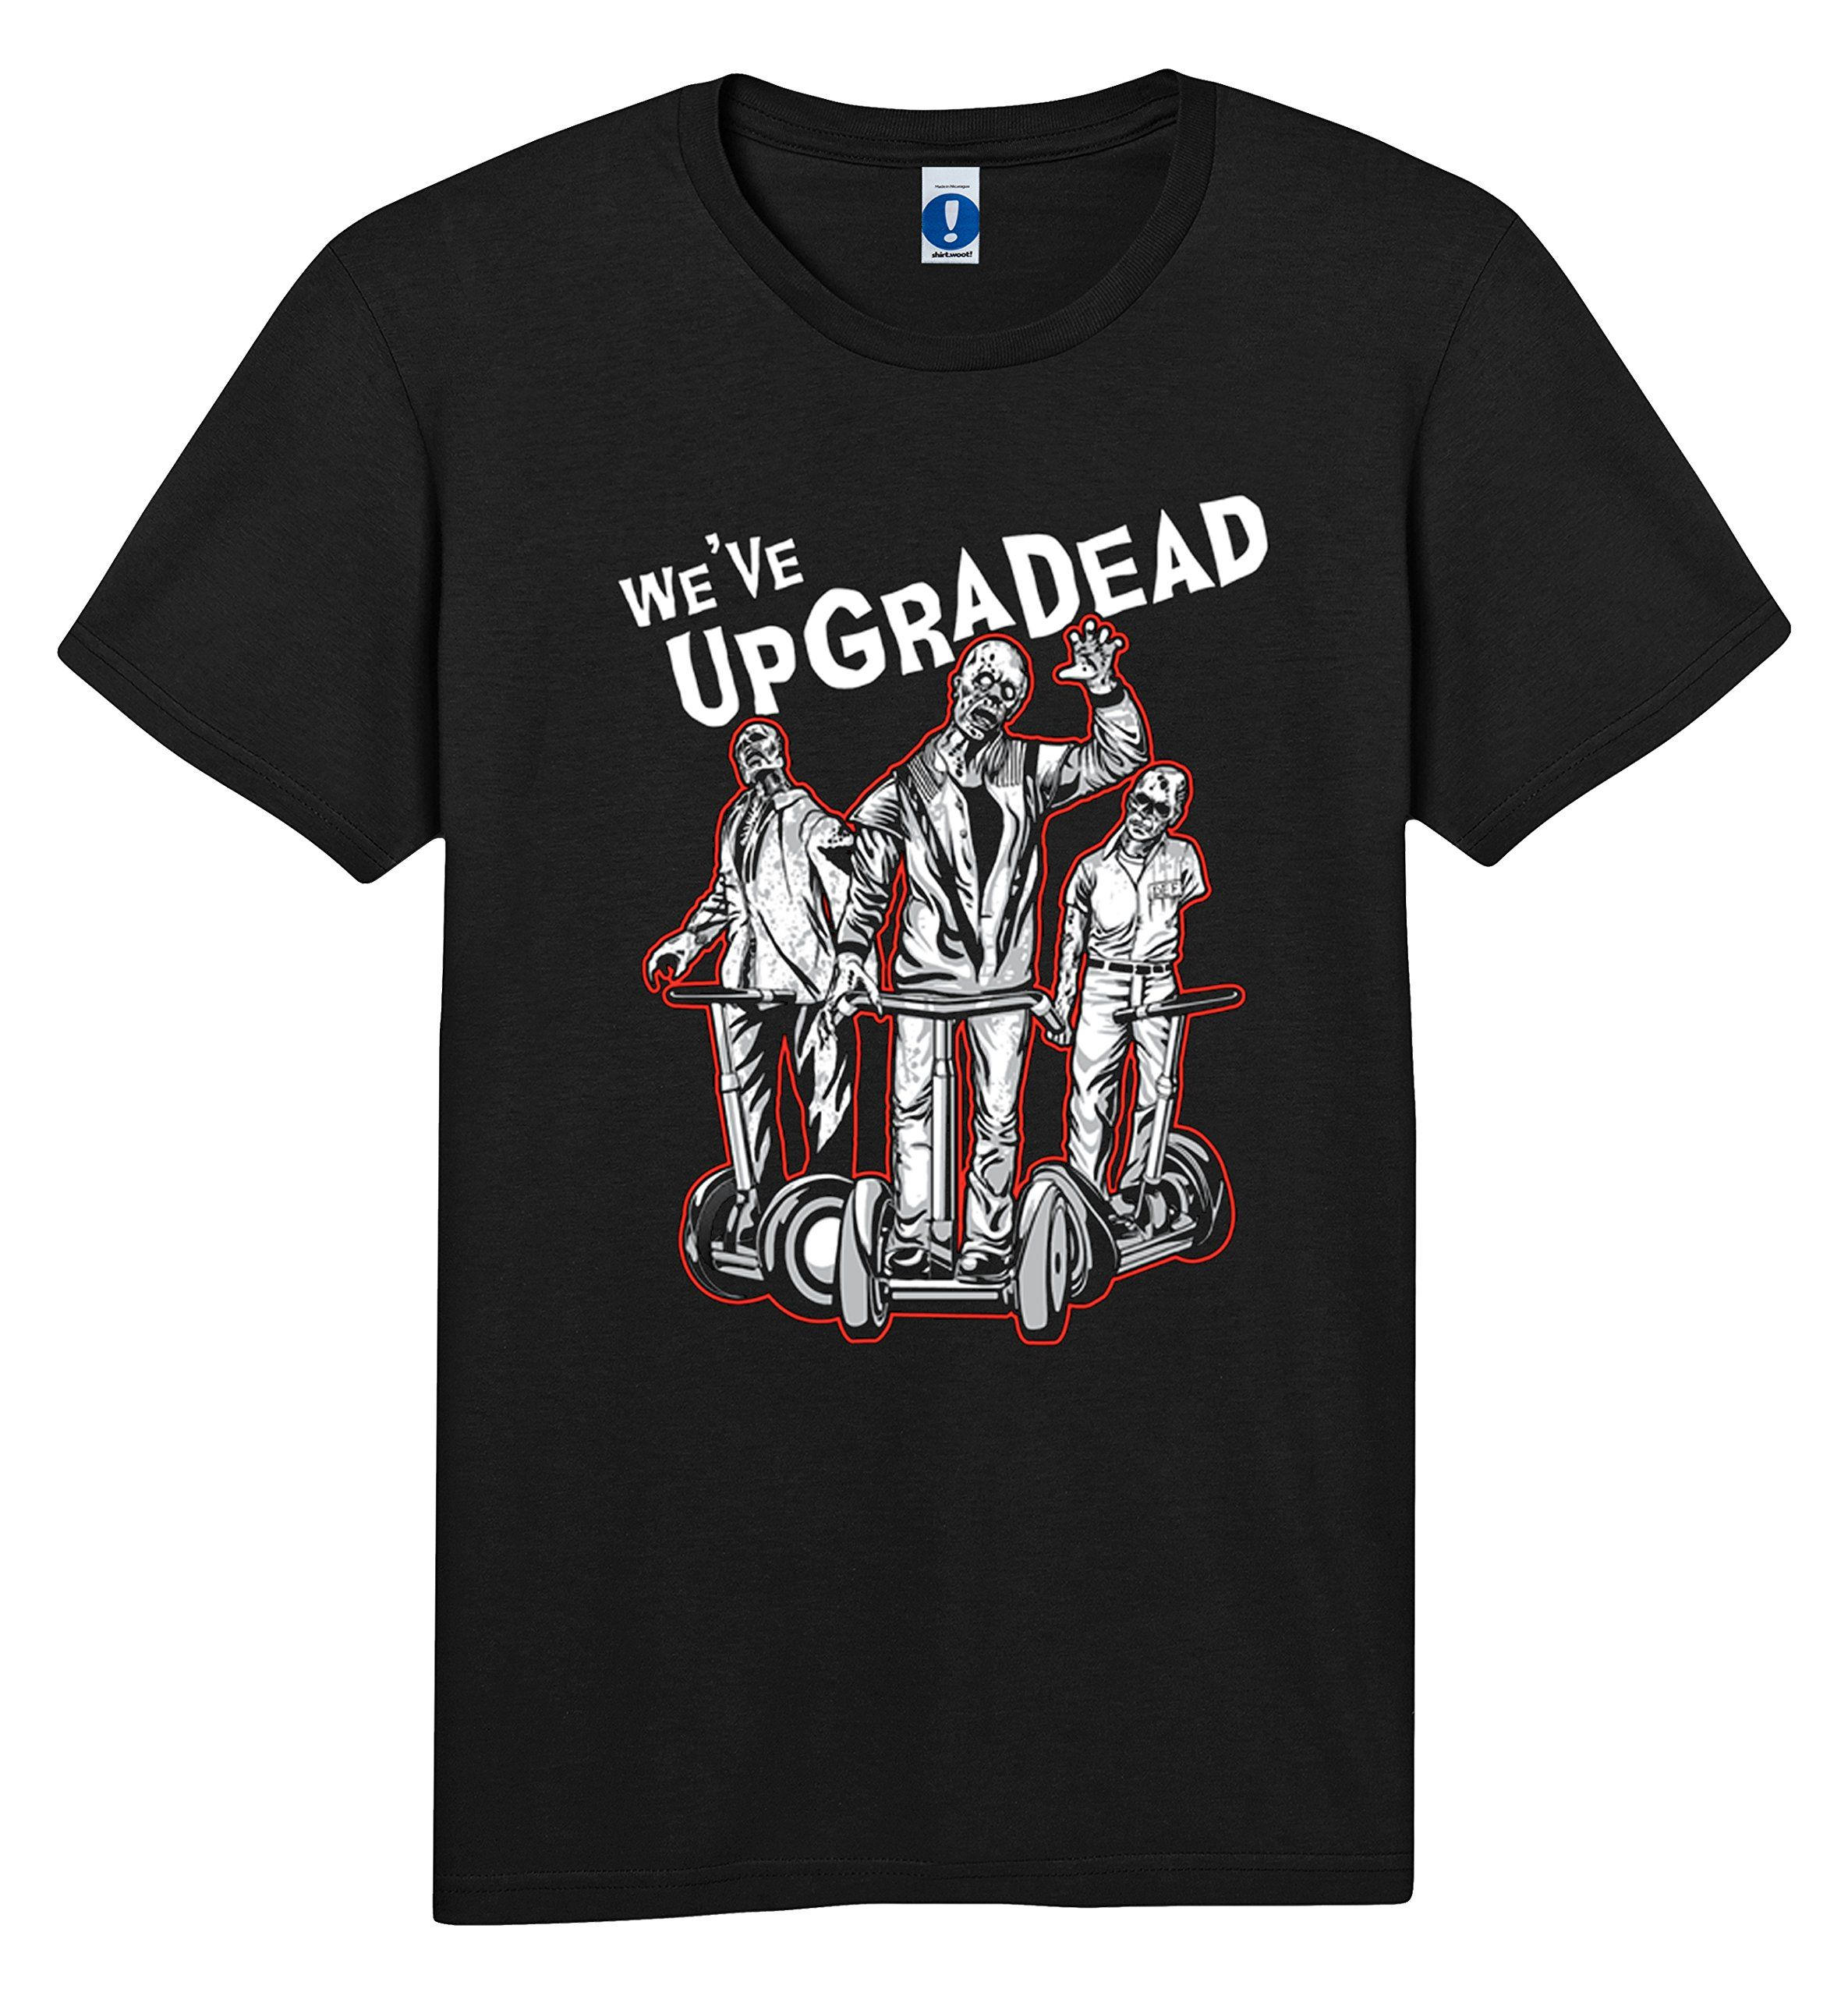 Men's UpgraDead T-Shirt